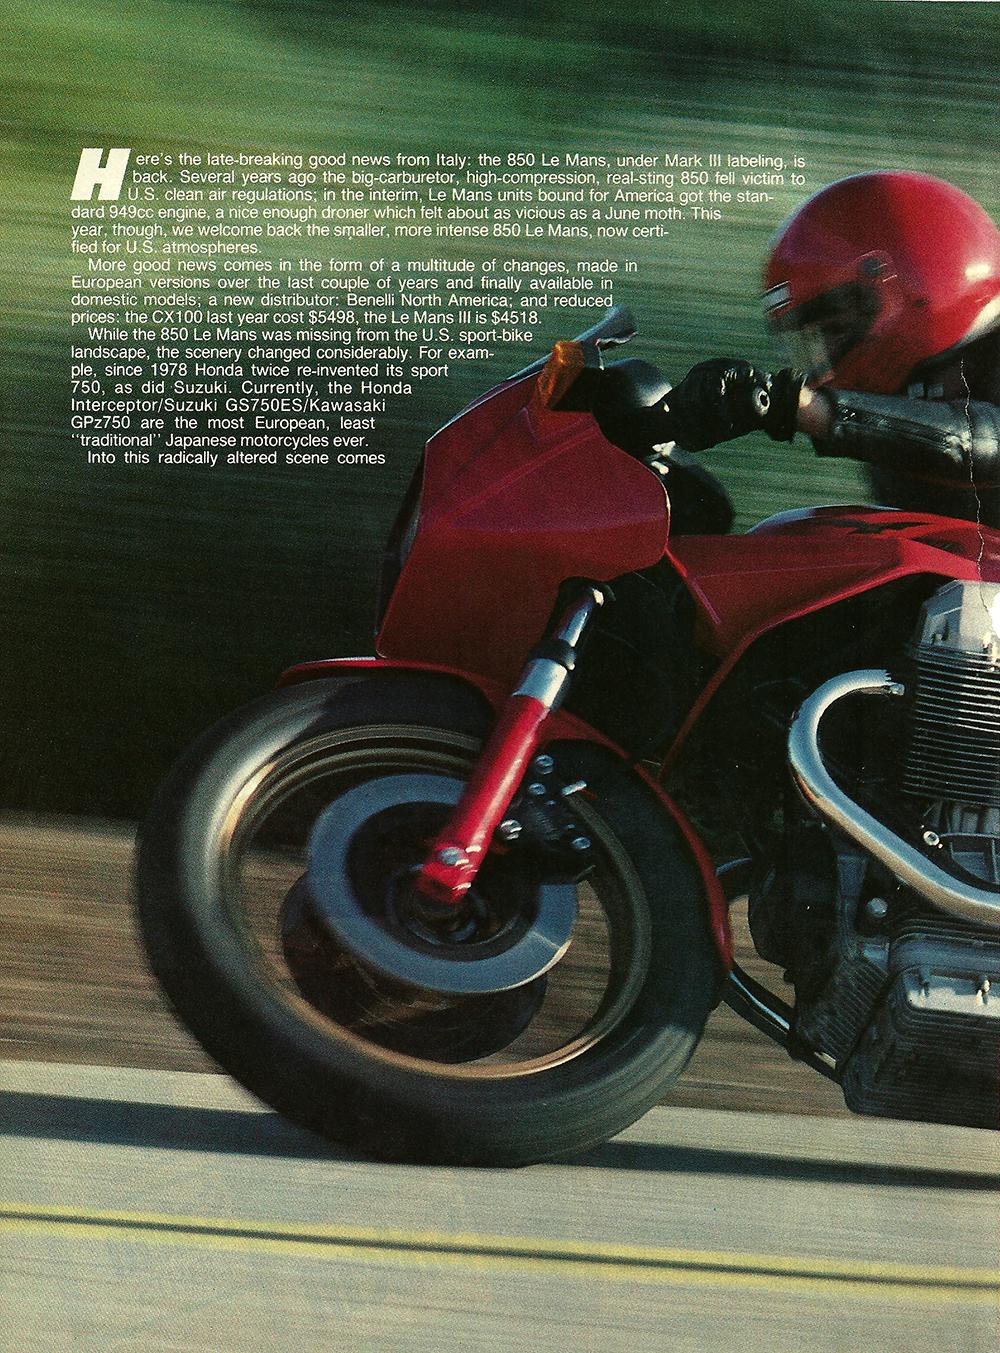 1983 Moto Guzzi 850 Lemans 3 road test 1.jpg